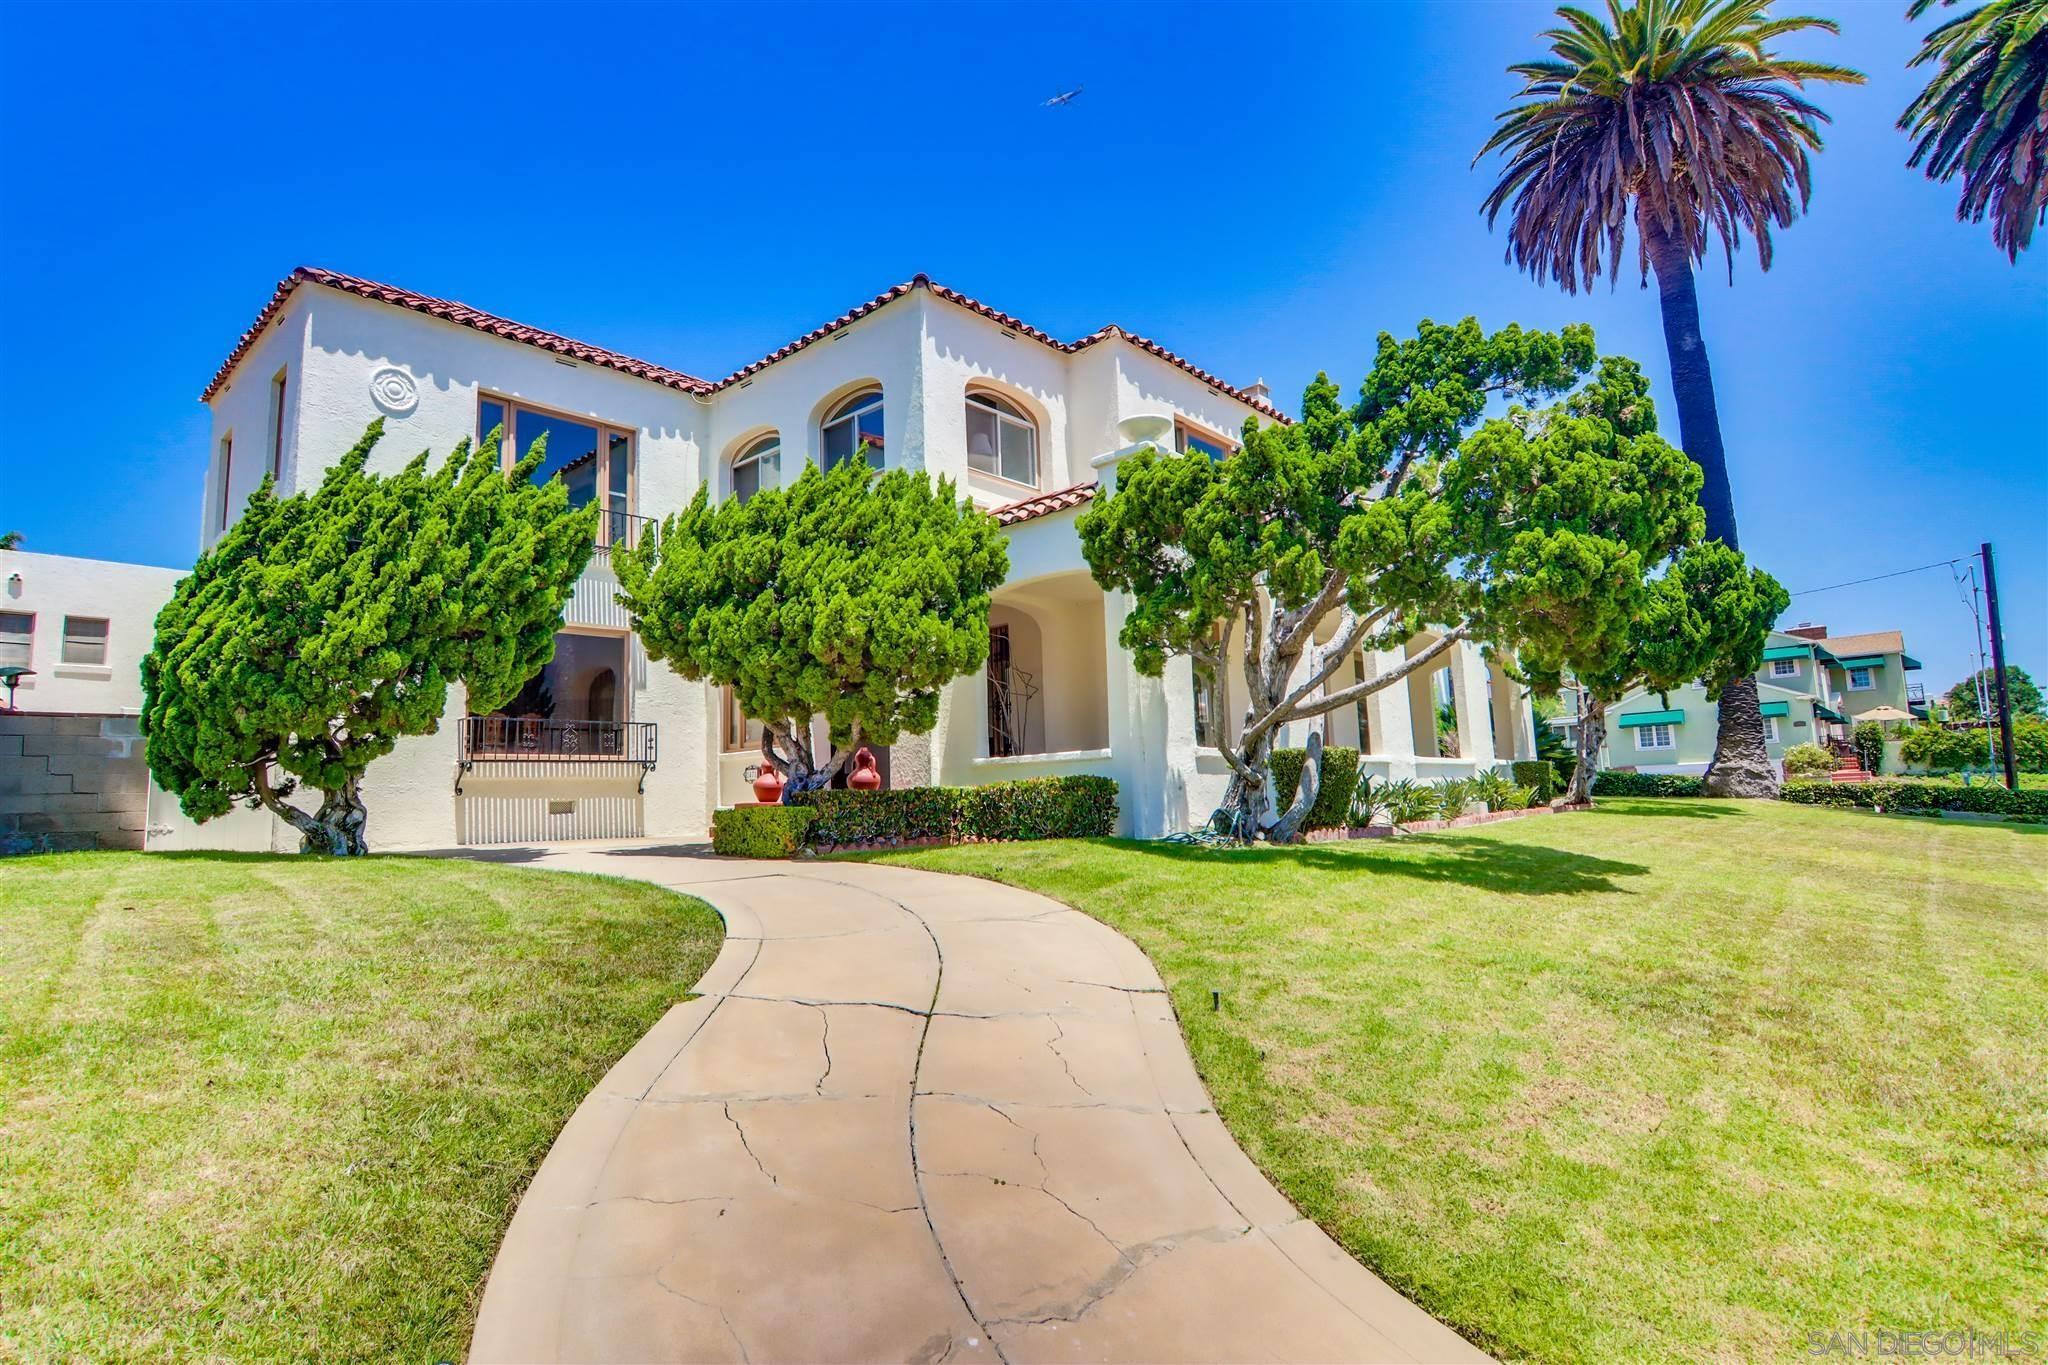 2478 Rosecrans St, San Diego, CA 92106